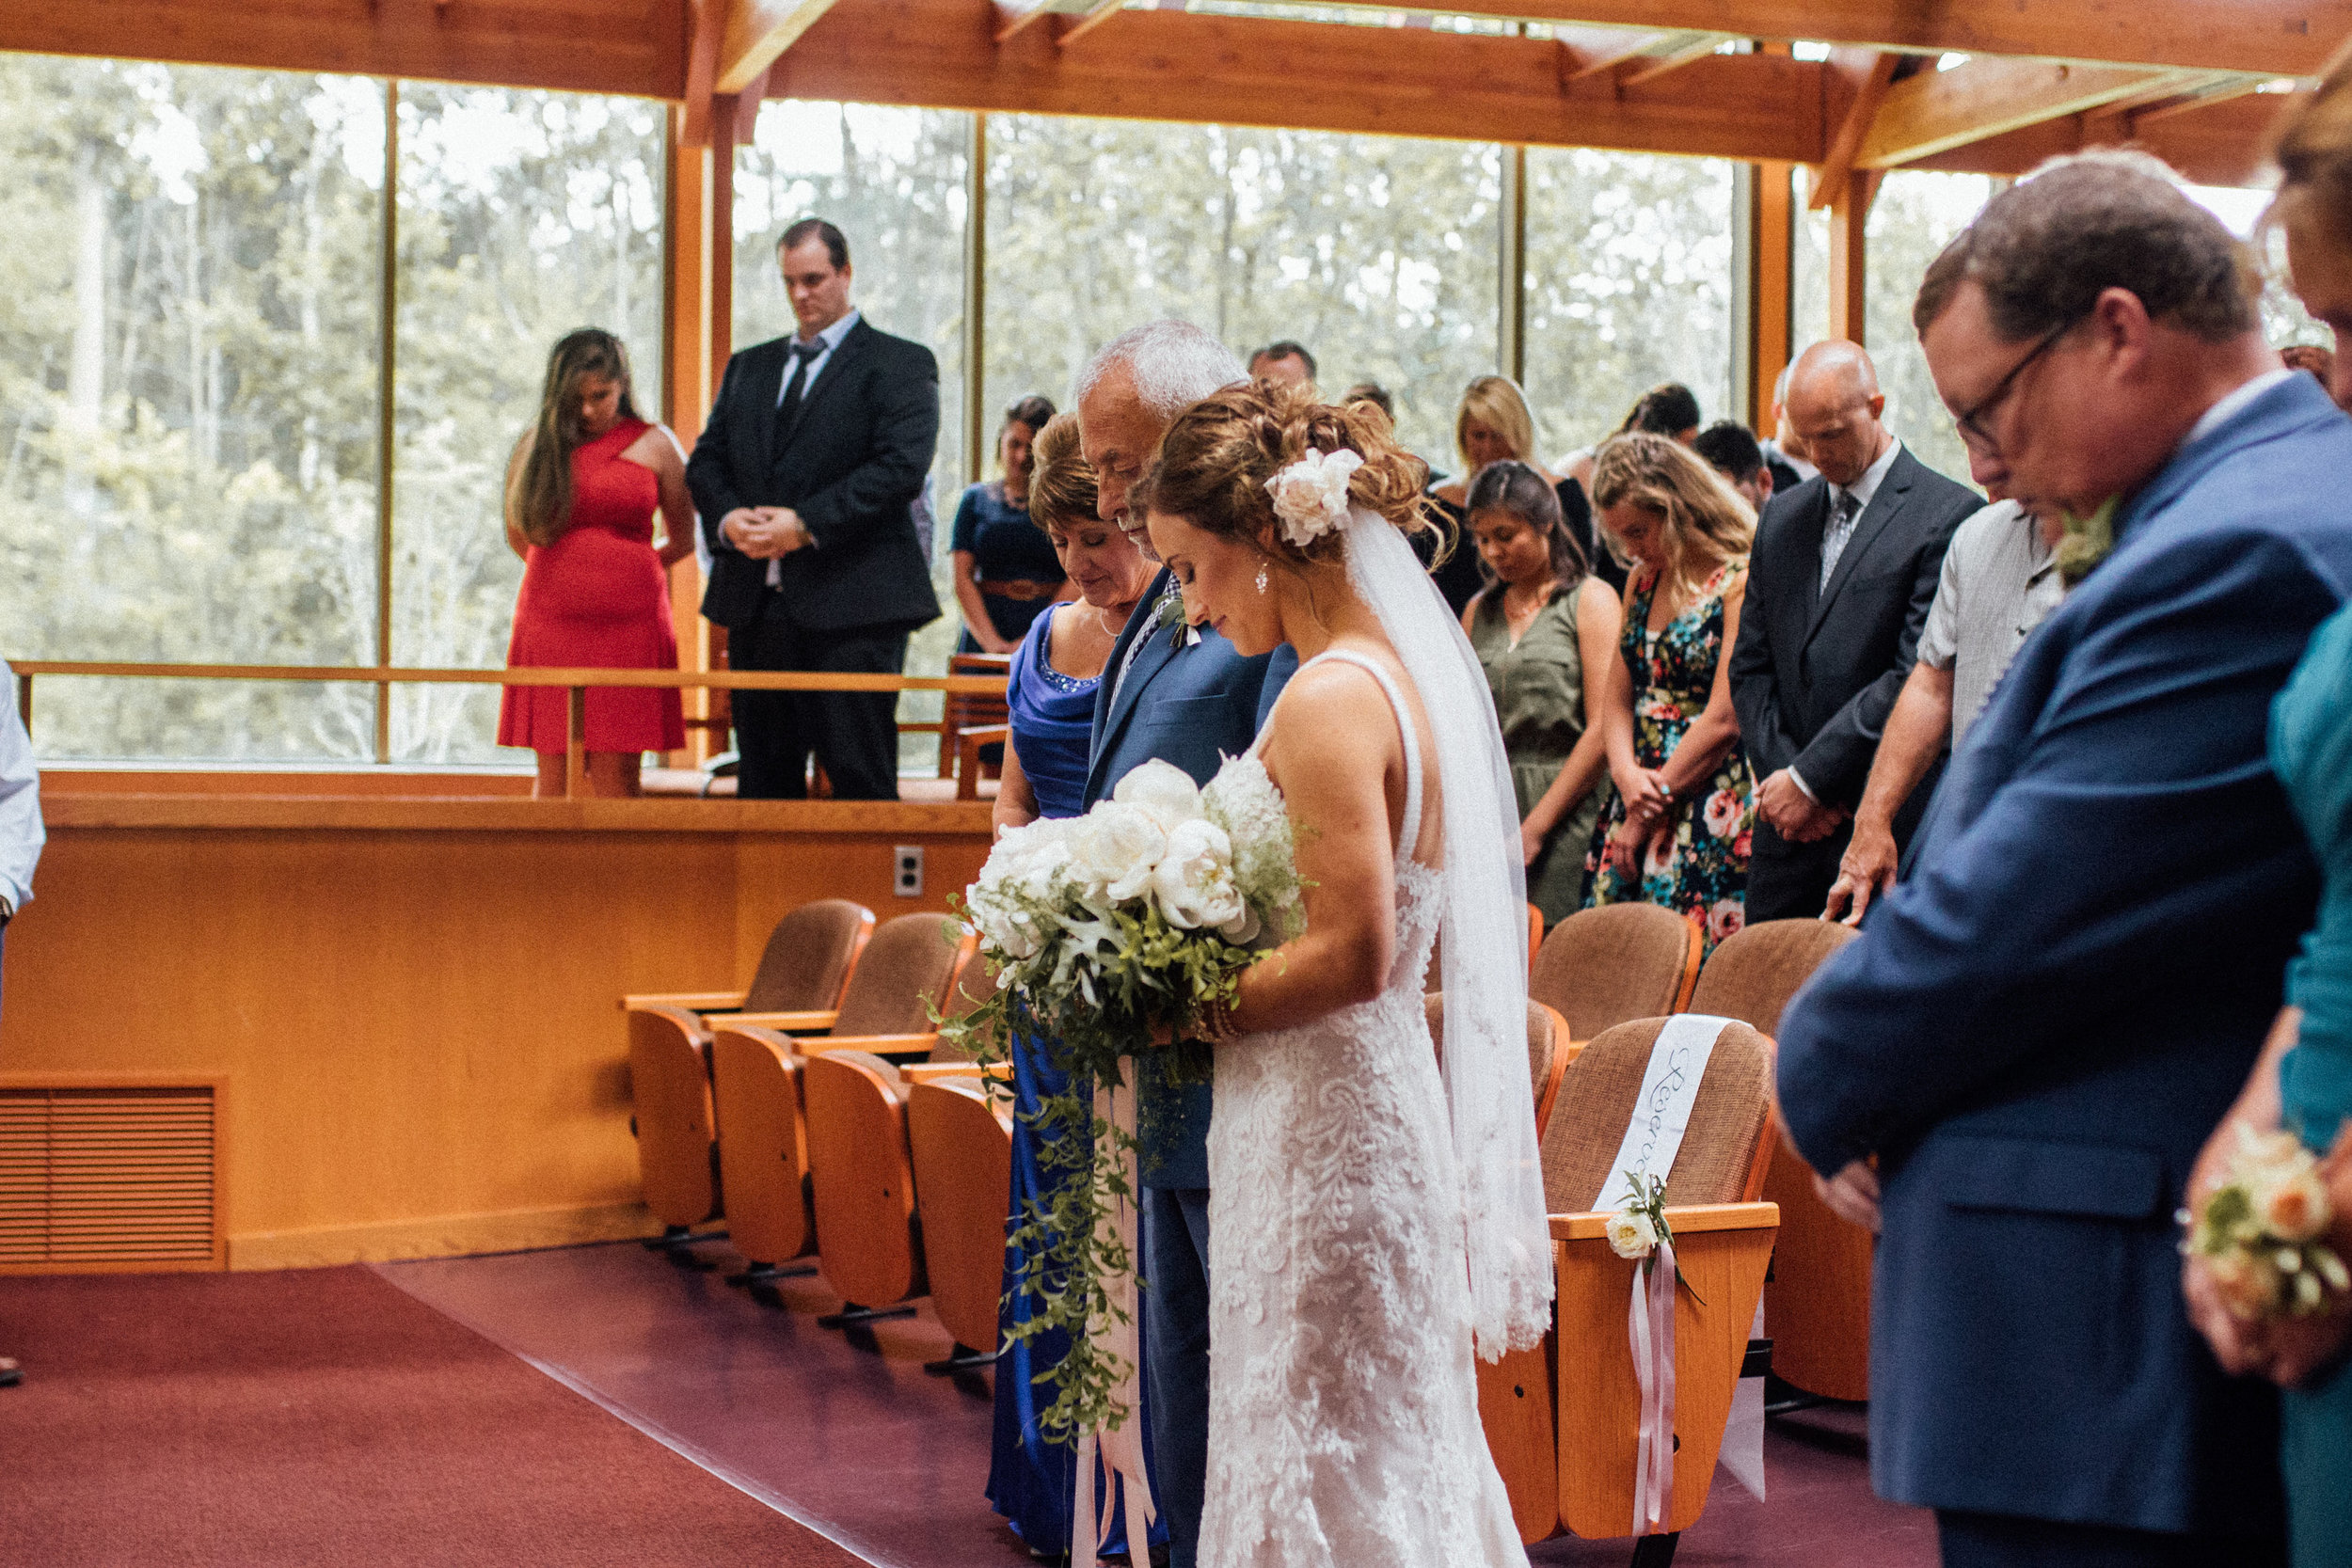 Whitney-Kevin-Ceremony-Michigan-Wedding-Photographer-55.jpg